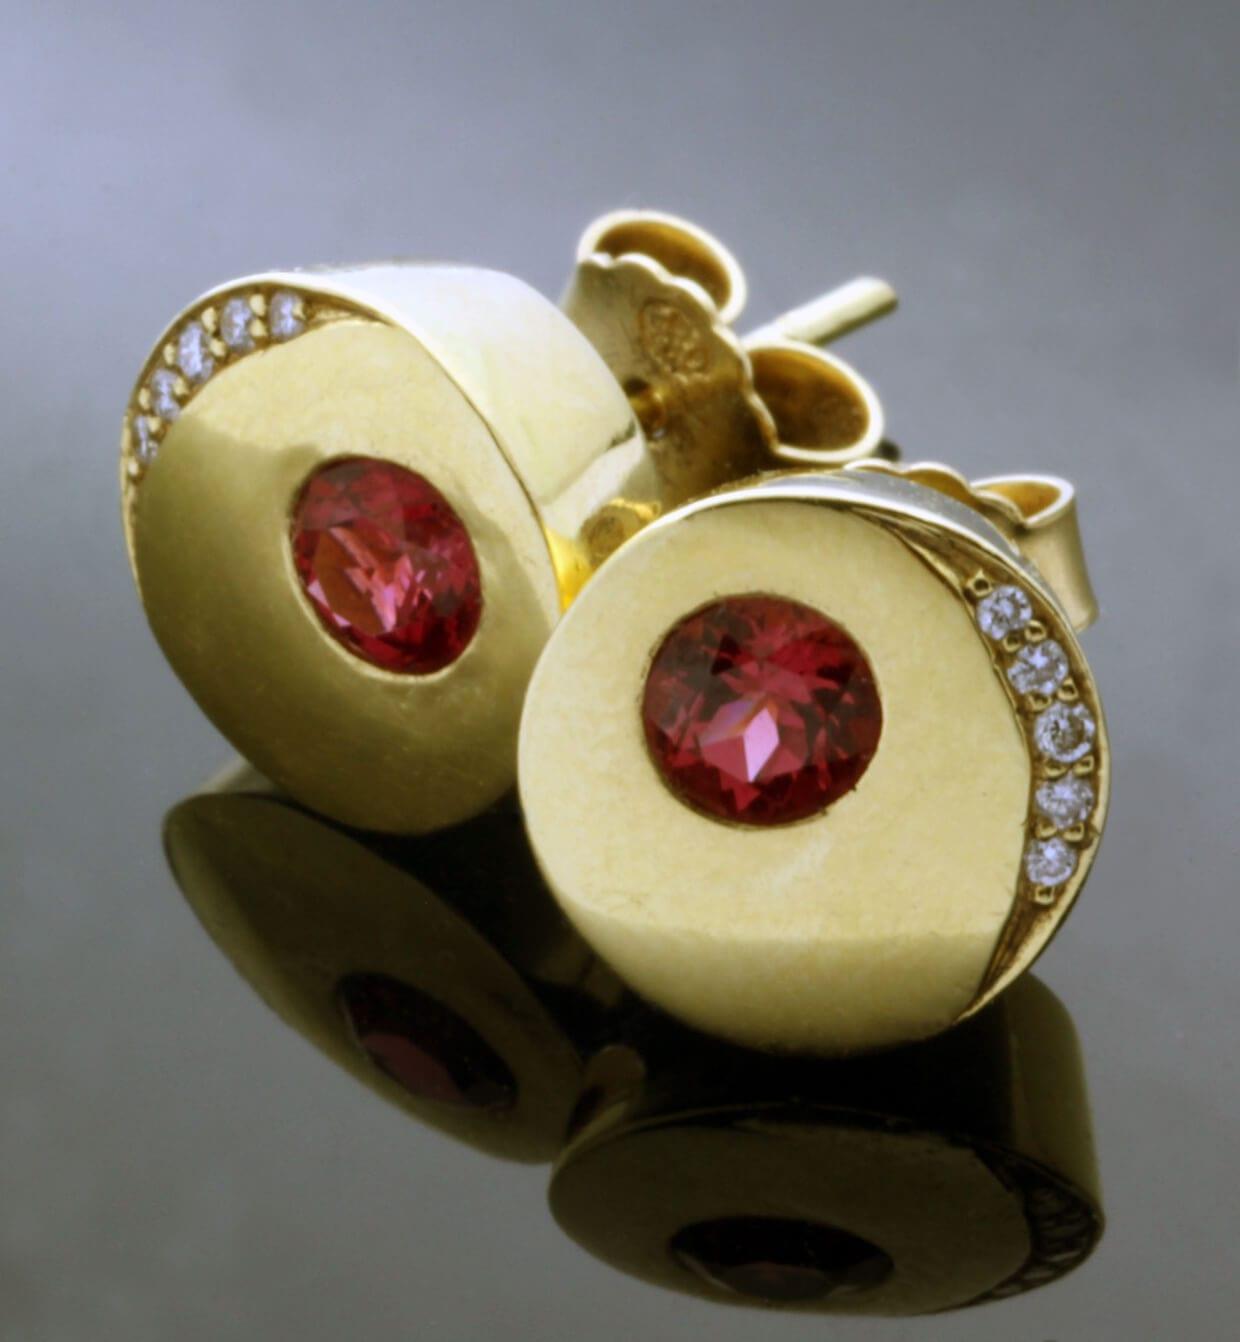 Handmade modern stud earrings Yellow Gold Red Spinel and Diamond gemstones